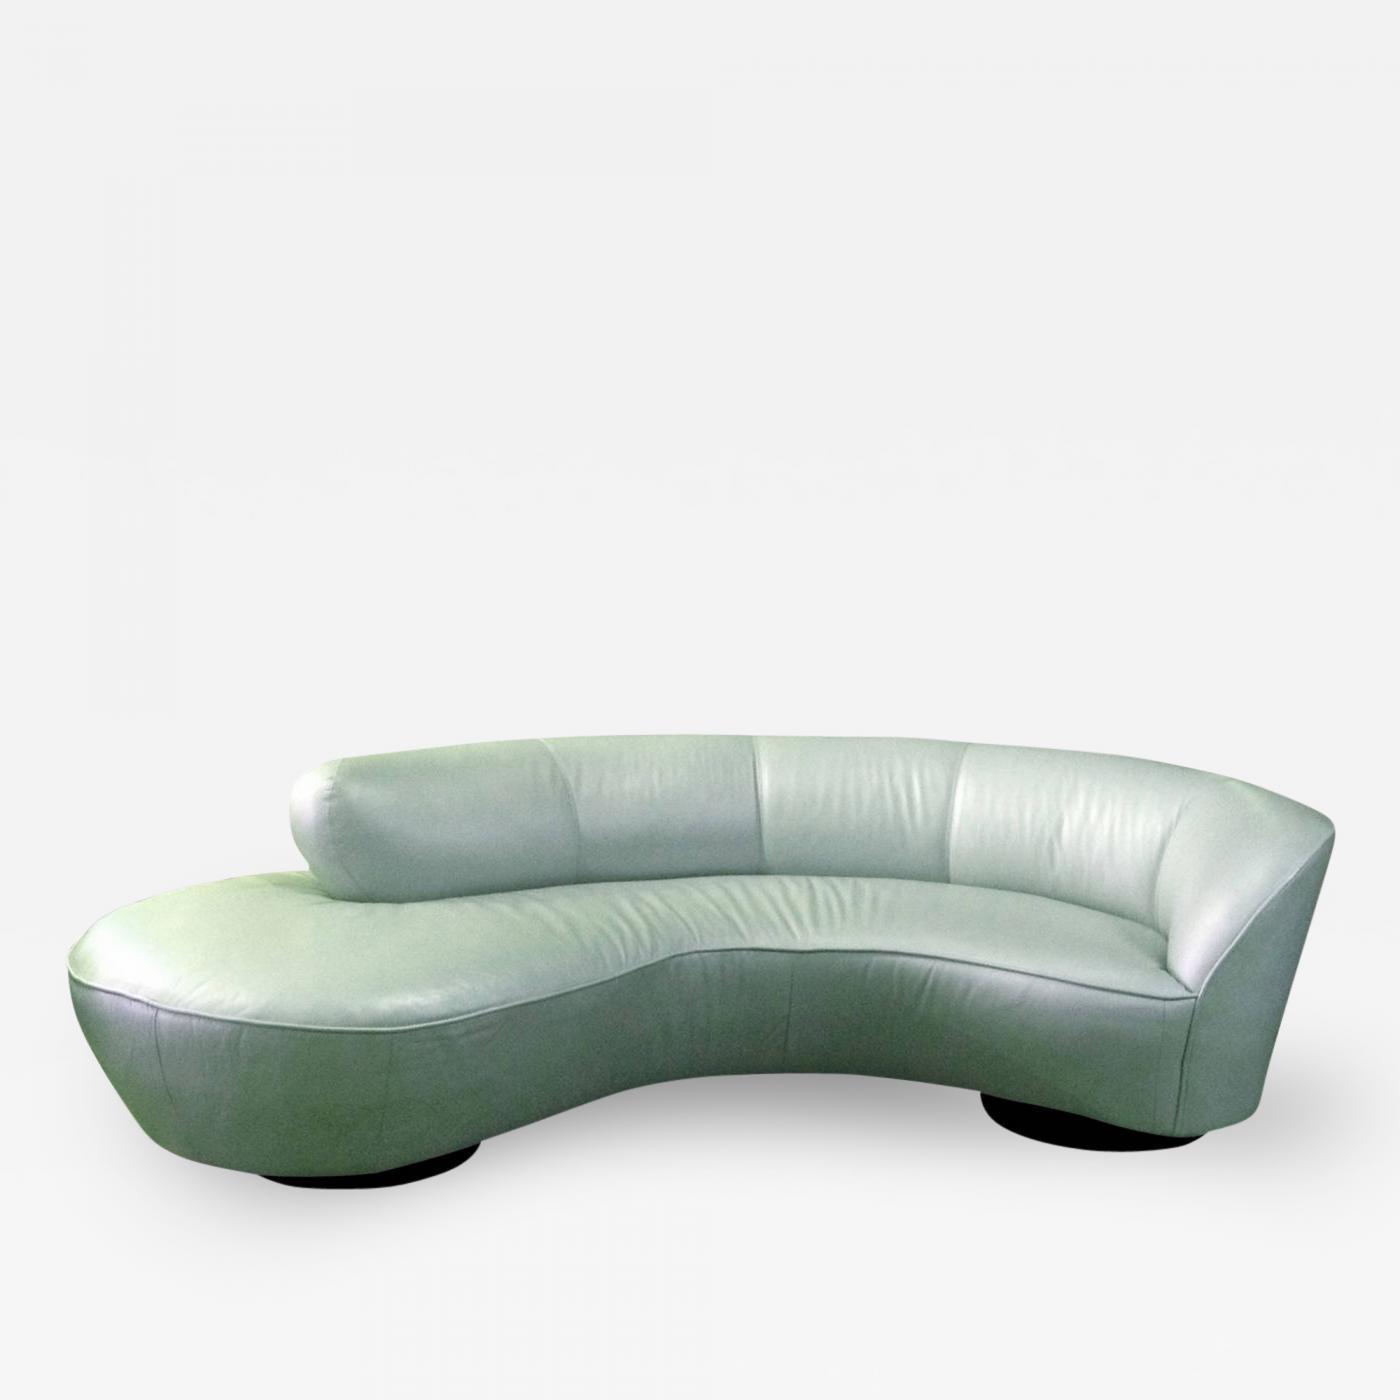 Vladimir Kagan Vladimir Kagan Serpentine Sofa & Ottoman